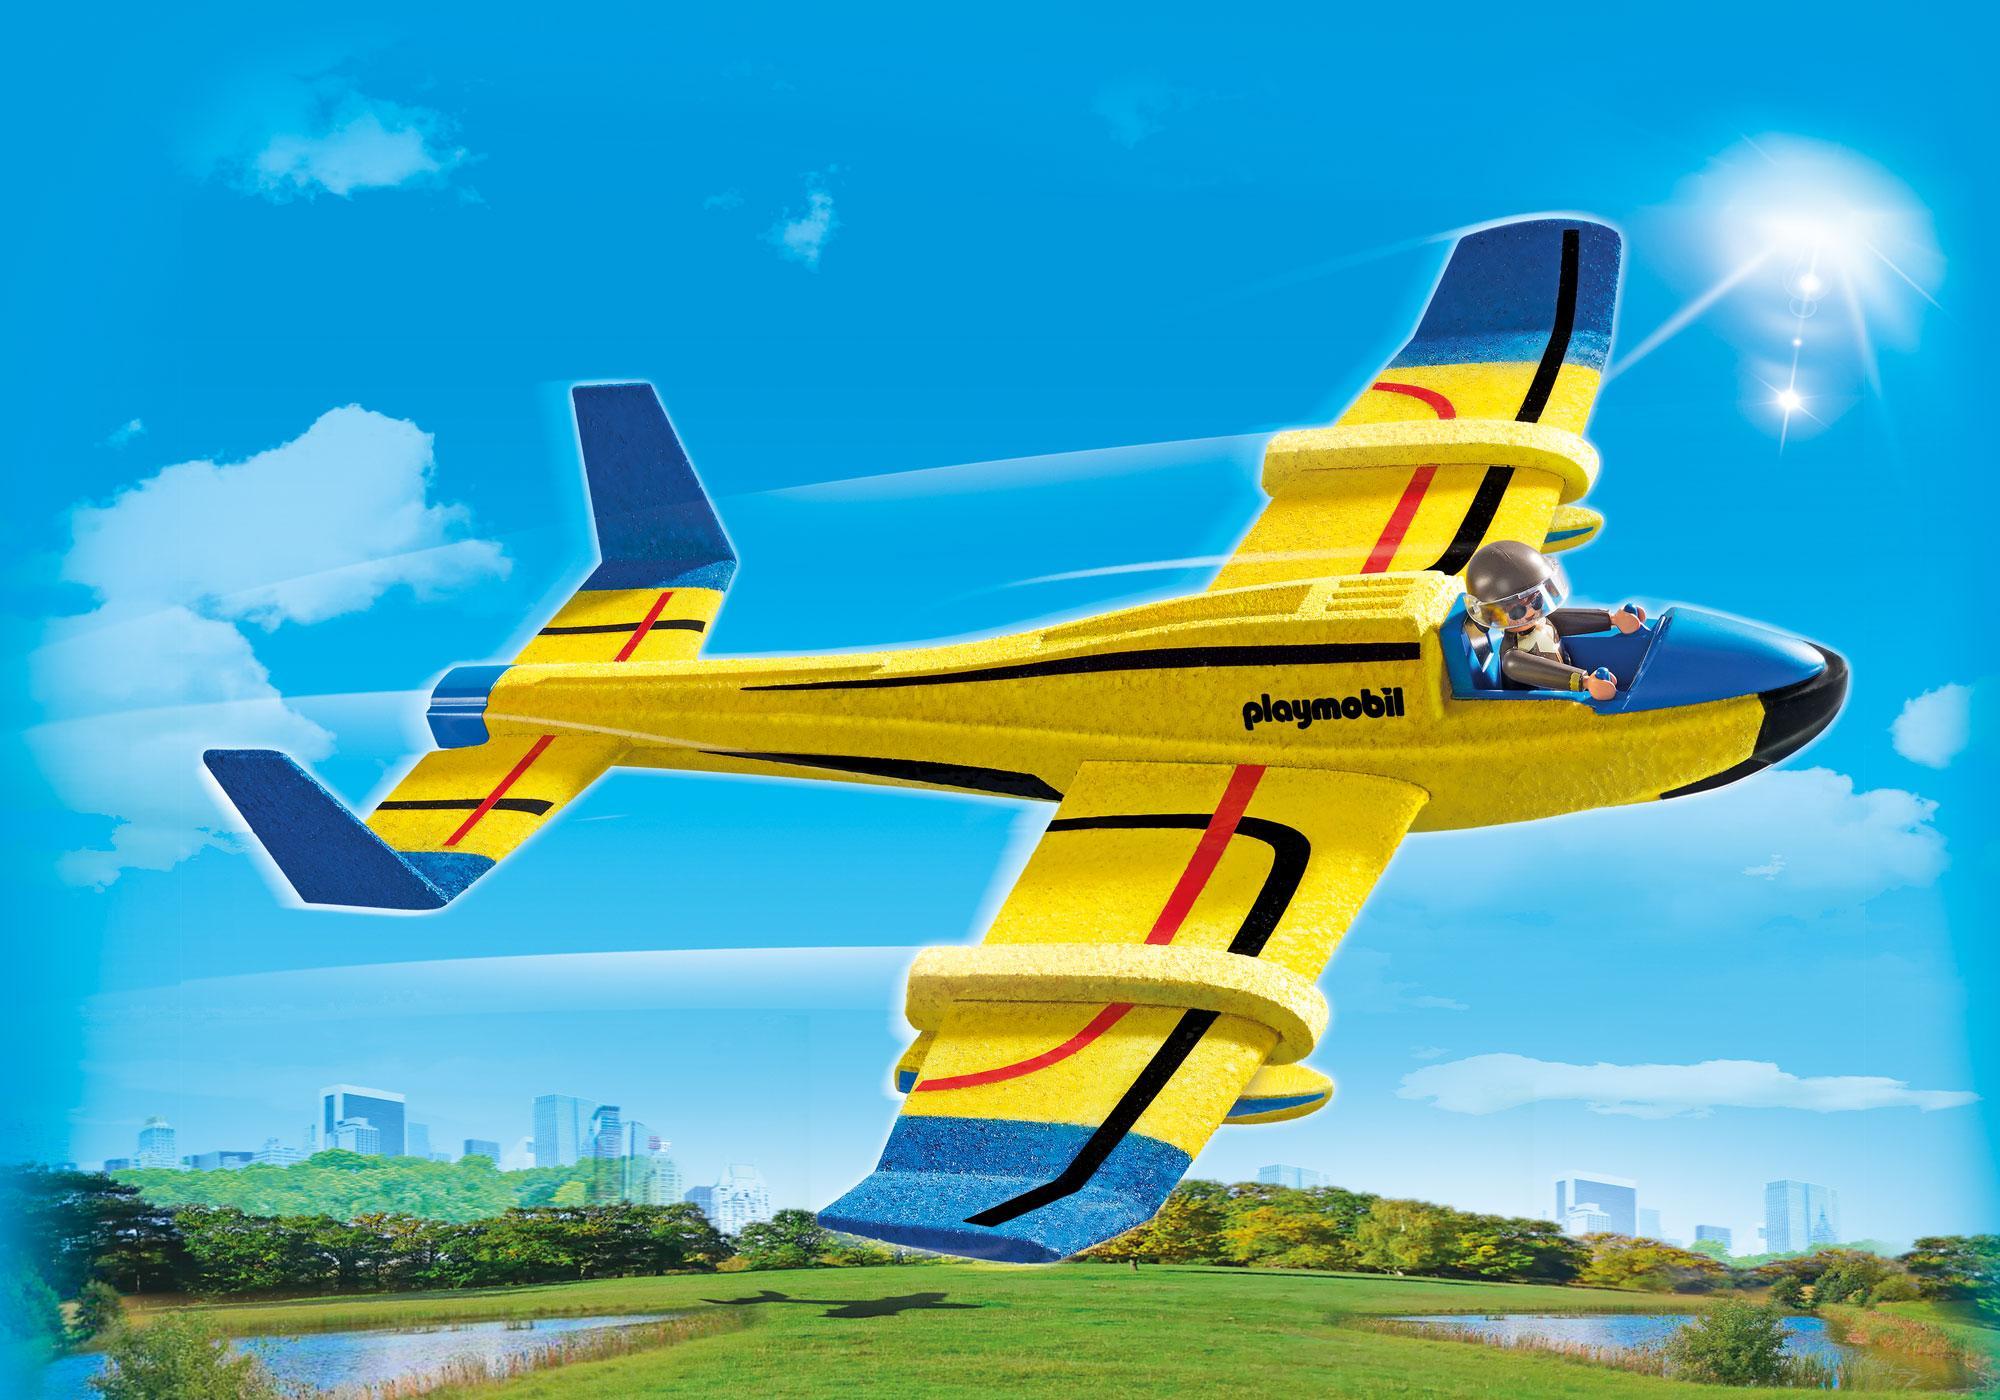 http://media.playmobil.com/i/playmobil/70057_product_detail/Kast-og-glid vandfly